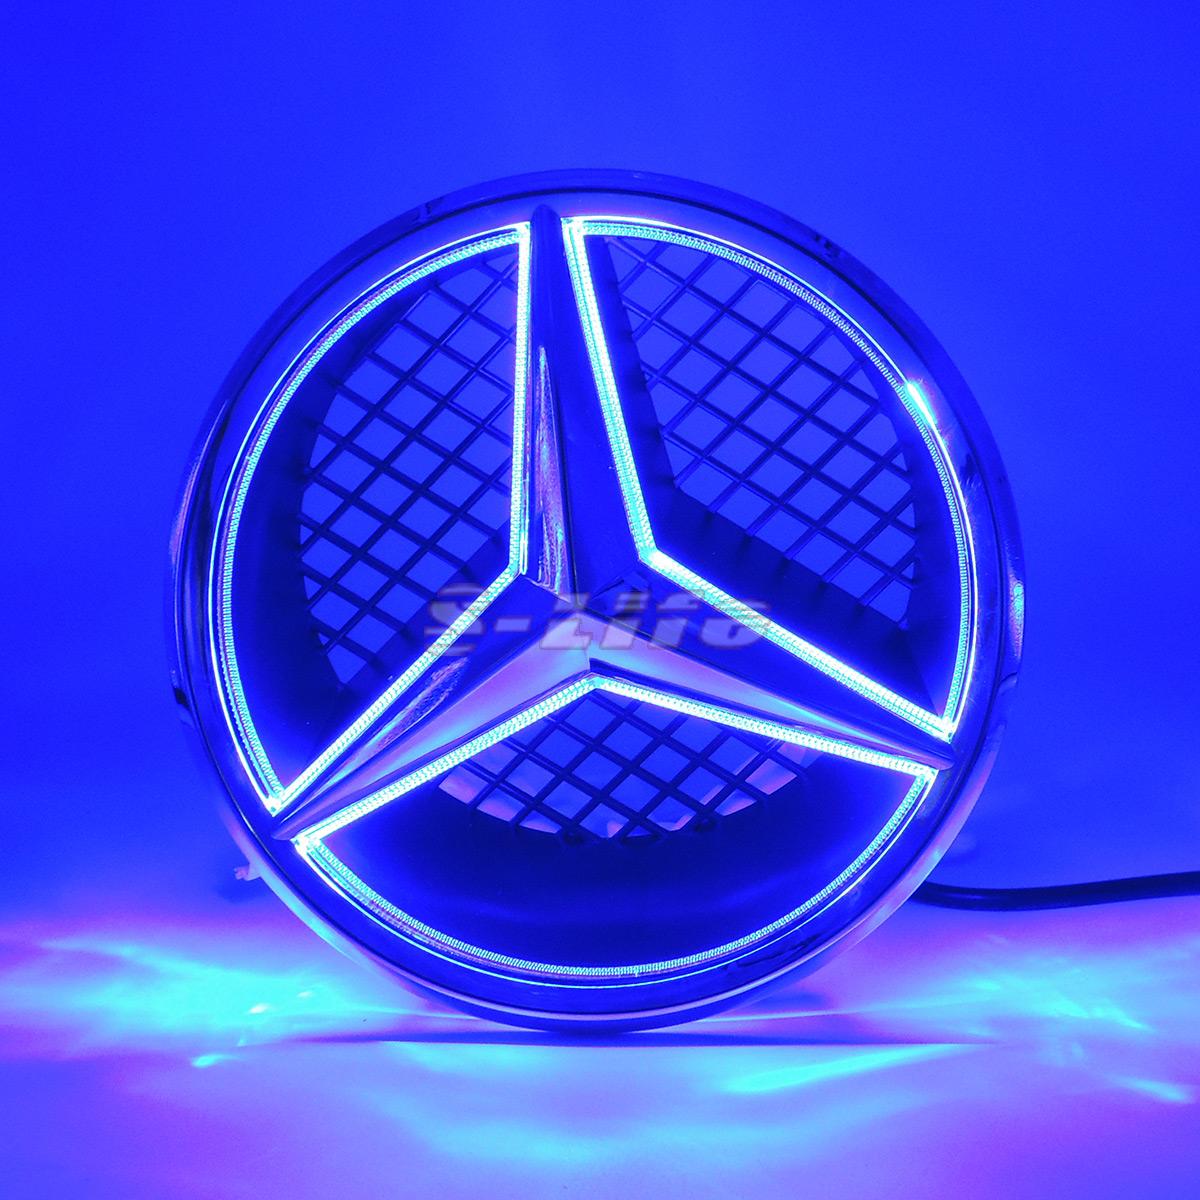 Mercedes Benz B Class W245 2005 2011 Front Bumper Grill: Blue Sport Car LED Front Grille Star Emblem Light For